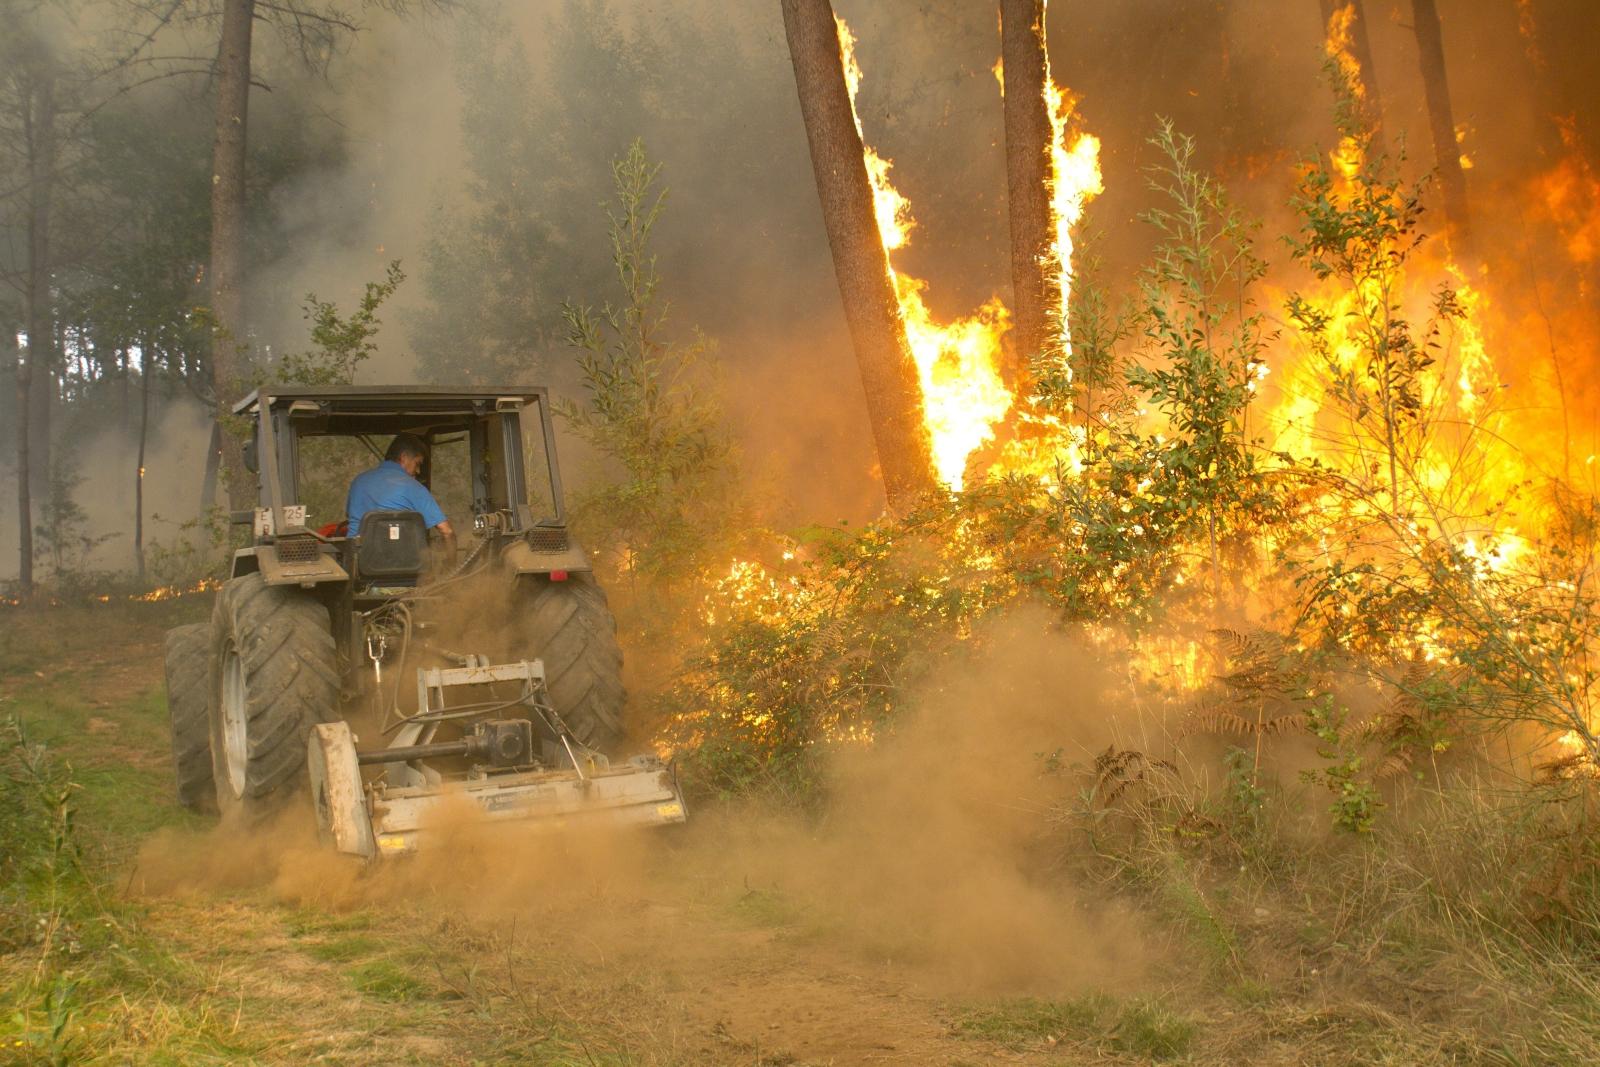 Pożary lasów w Hiszpanii  EPA/Salvador Sas